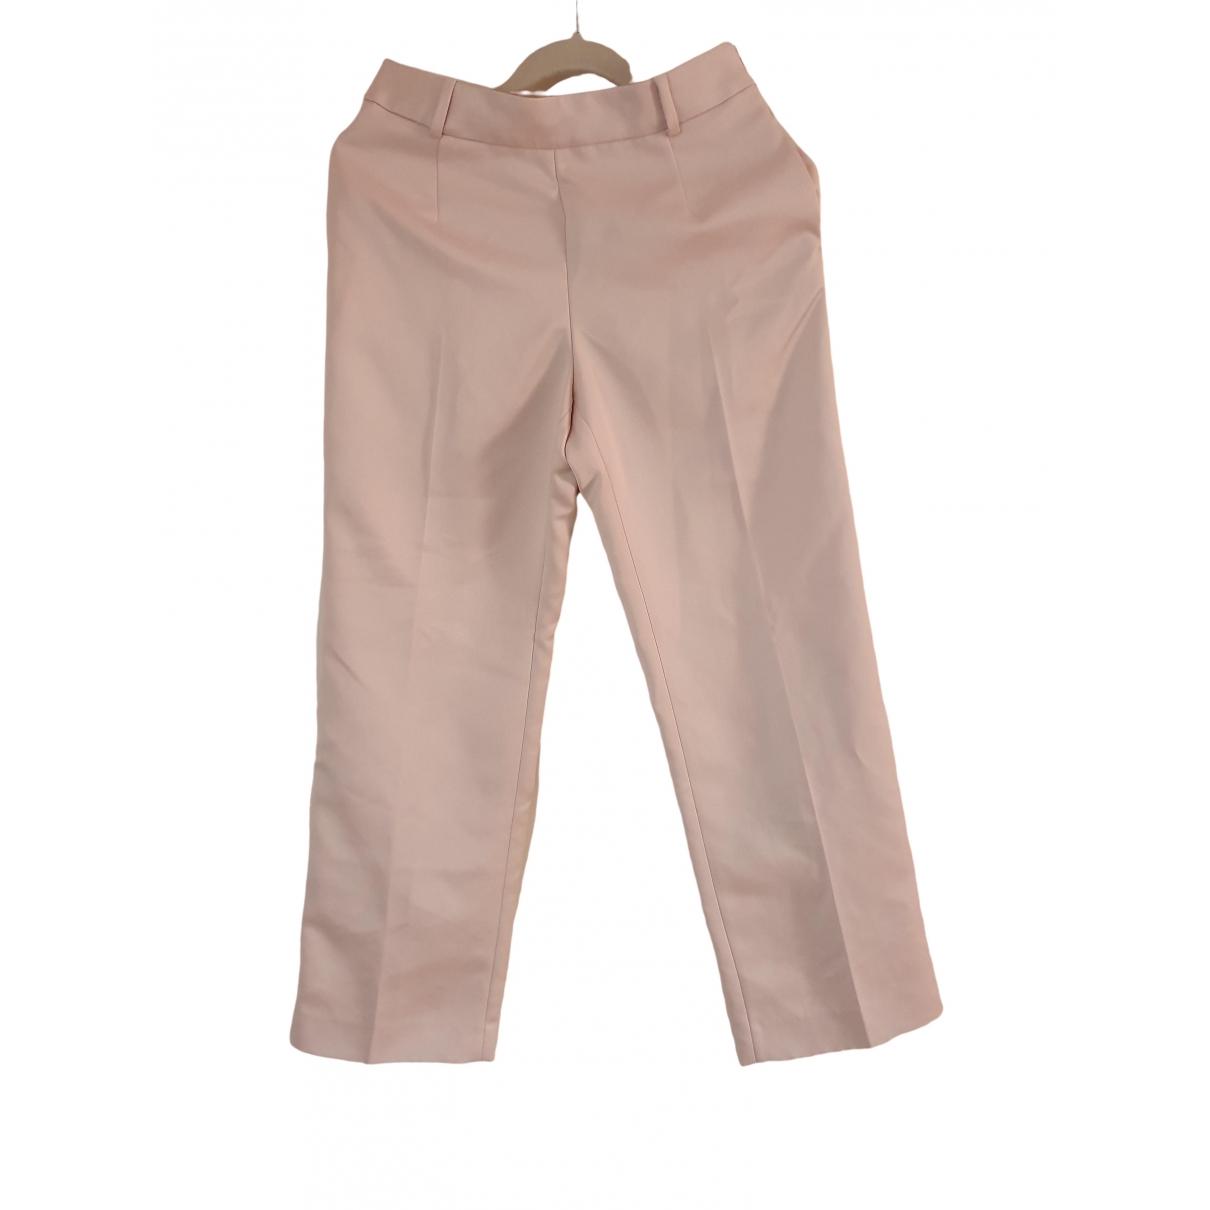 Ermanno Scervino \N Beige Trousers for Women 40 IT